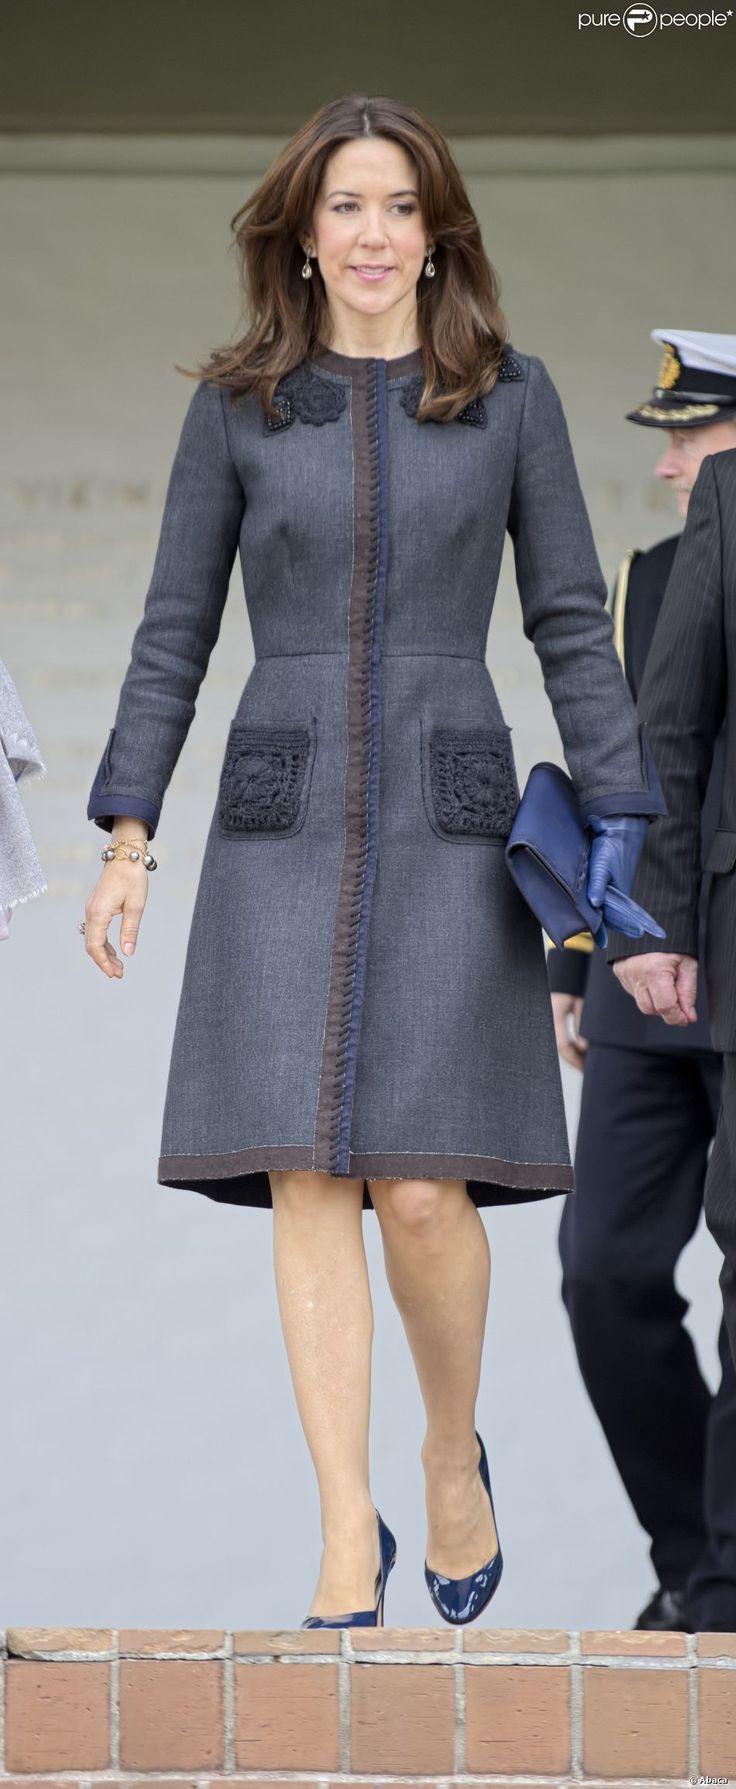 Navy and gray coat dress on Crown Princess Mary of Denmark